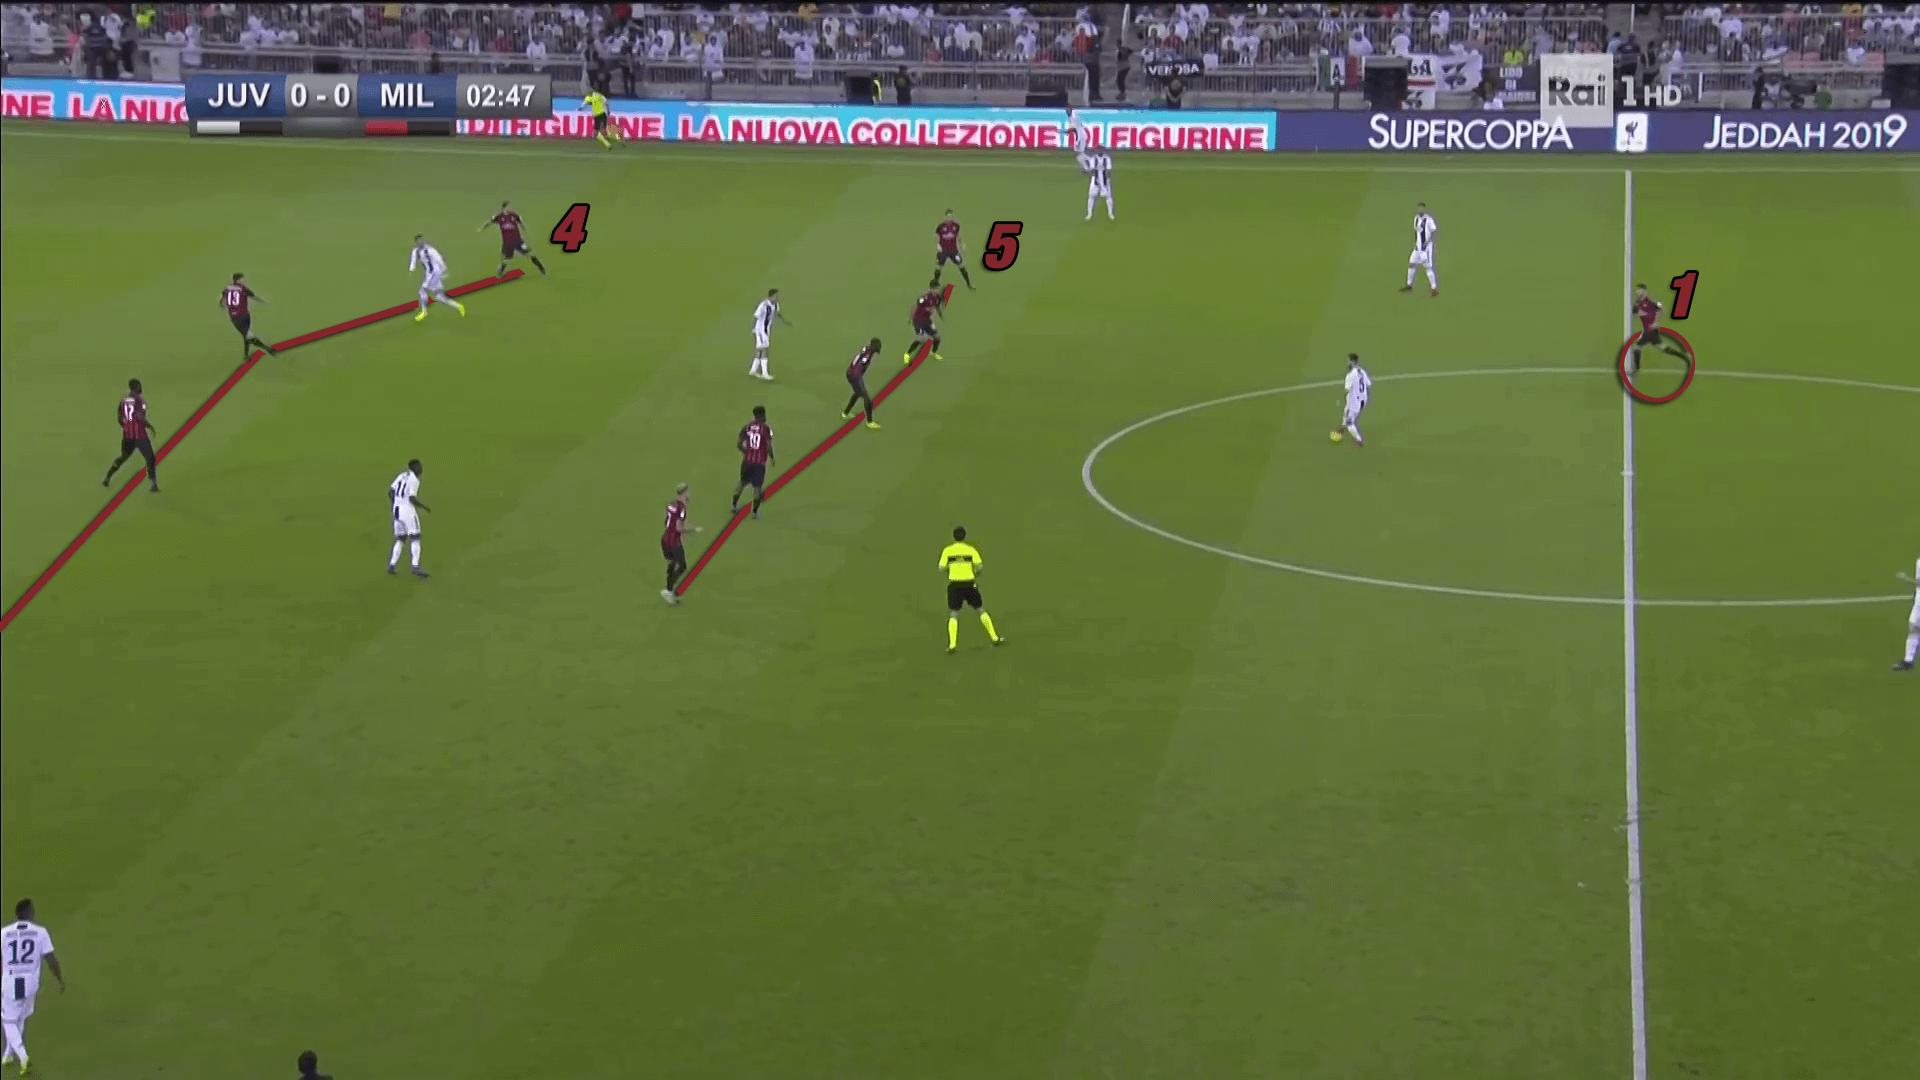 Supercoppa Italiana Juventus Turin AC Milan Allegri Gattuso Tactical Analysis Statistics